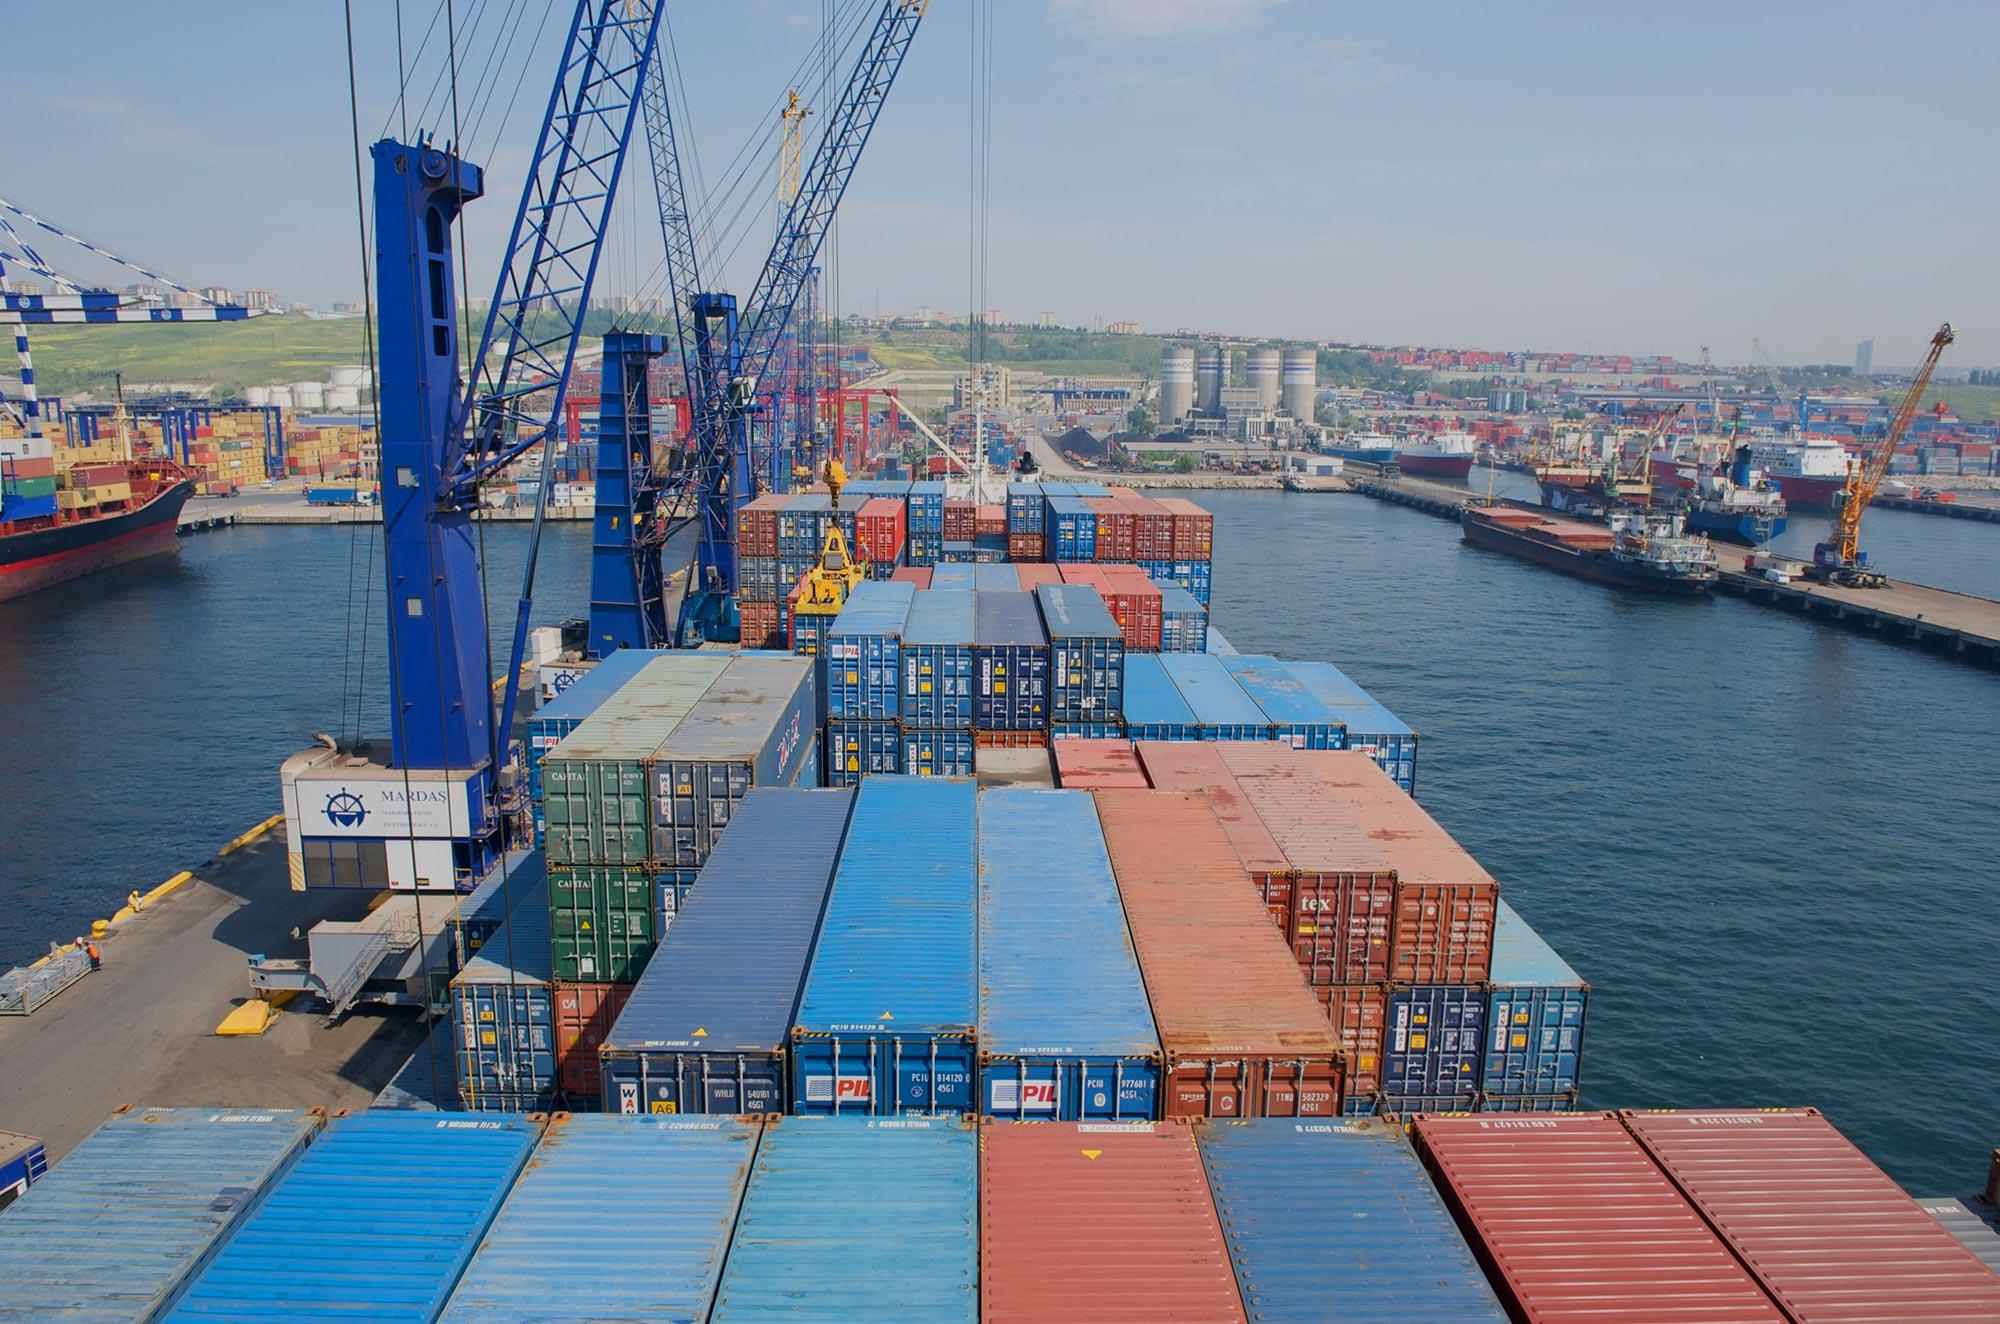 Konecranes Gottwald mobile harbor crane container handling spreader